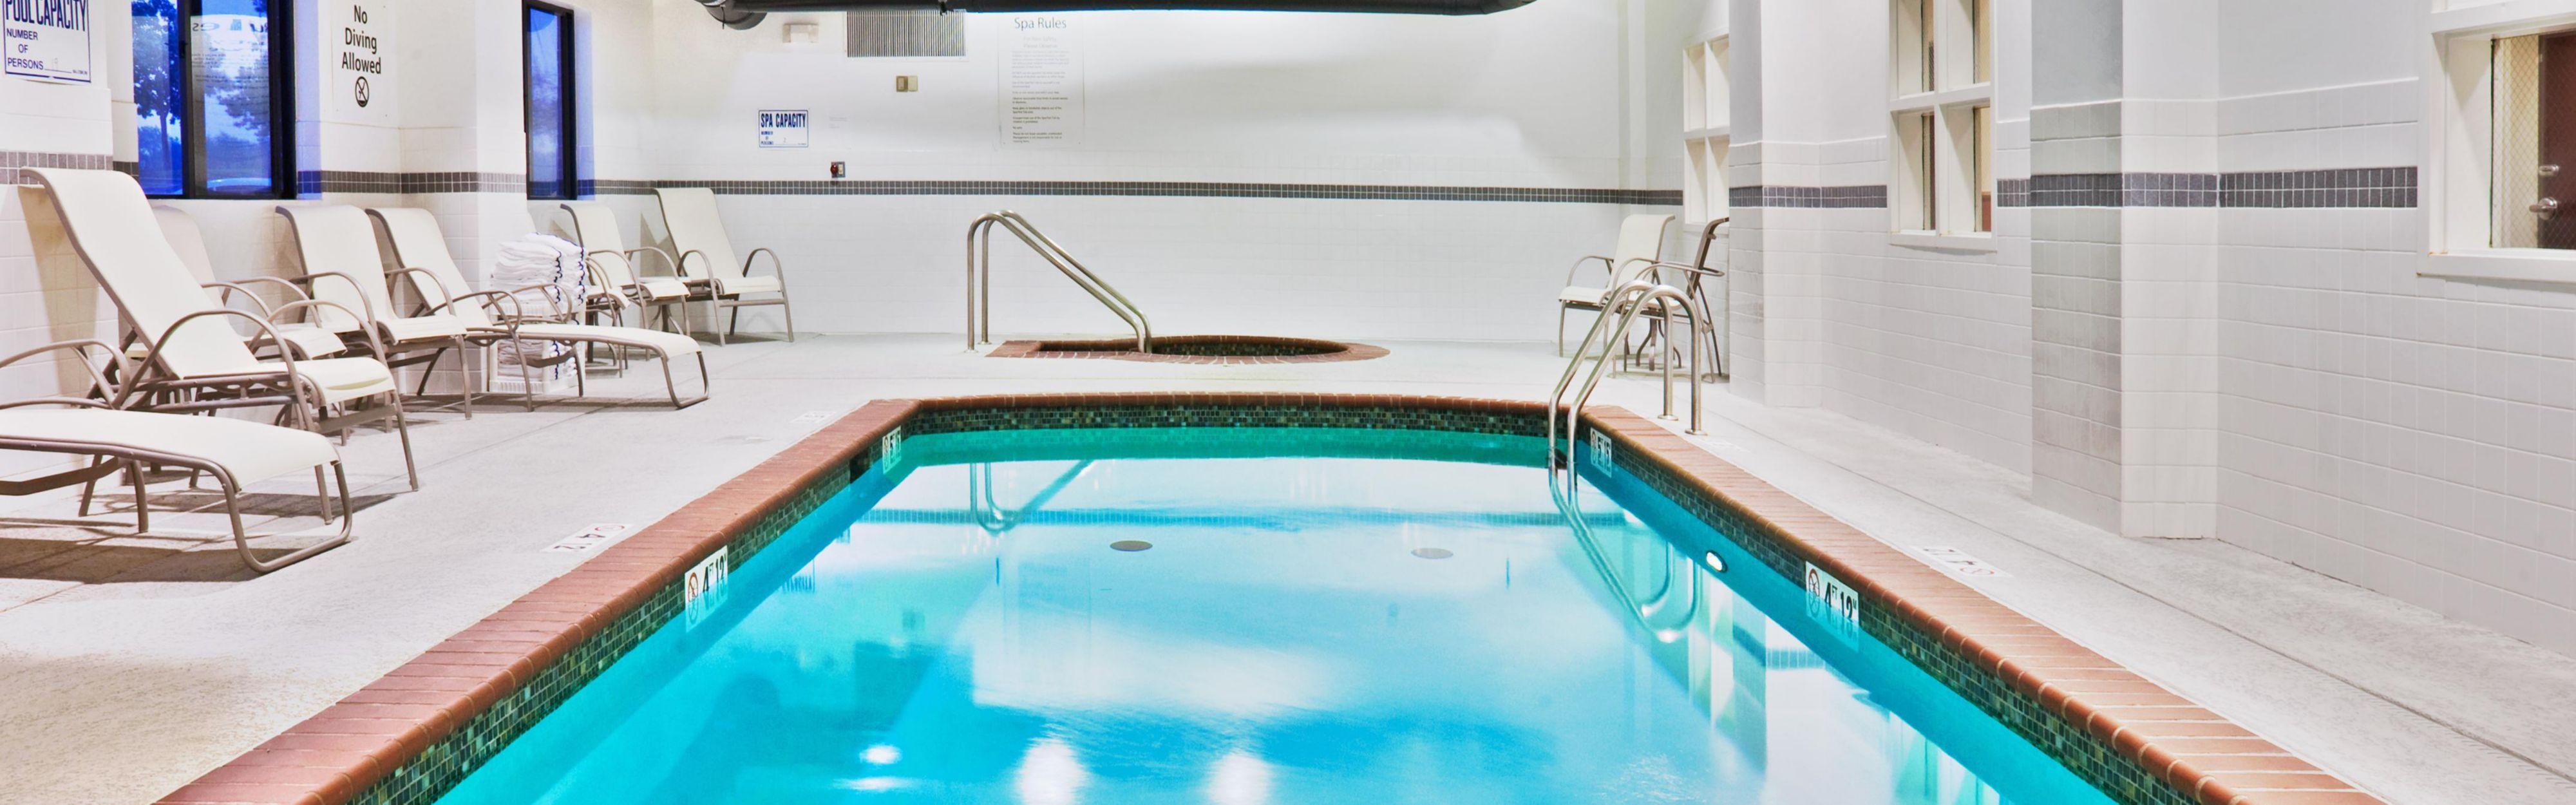 Holiday Inn Express & Suites Bartlesville image 1